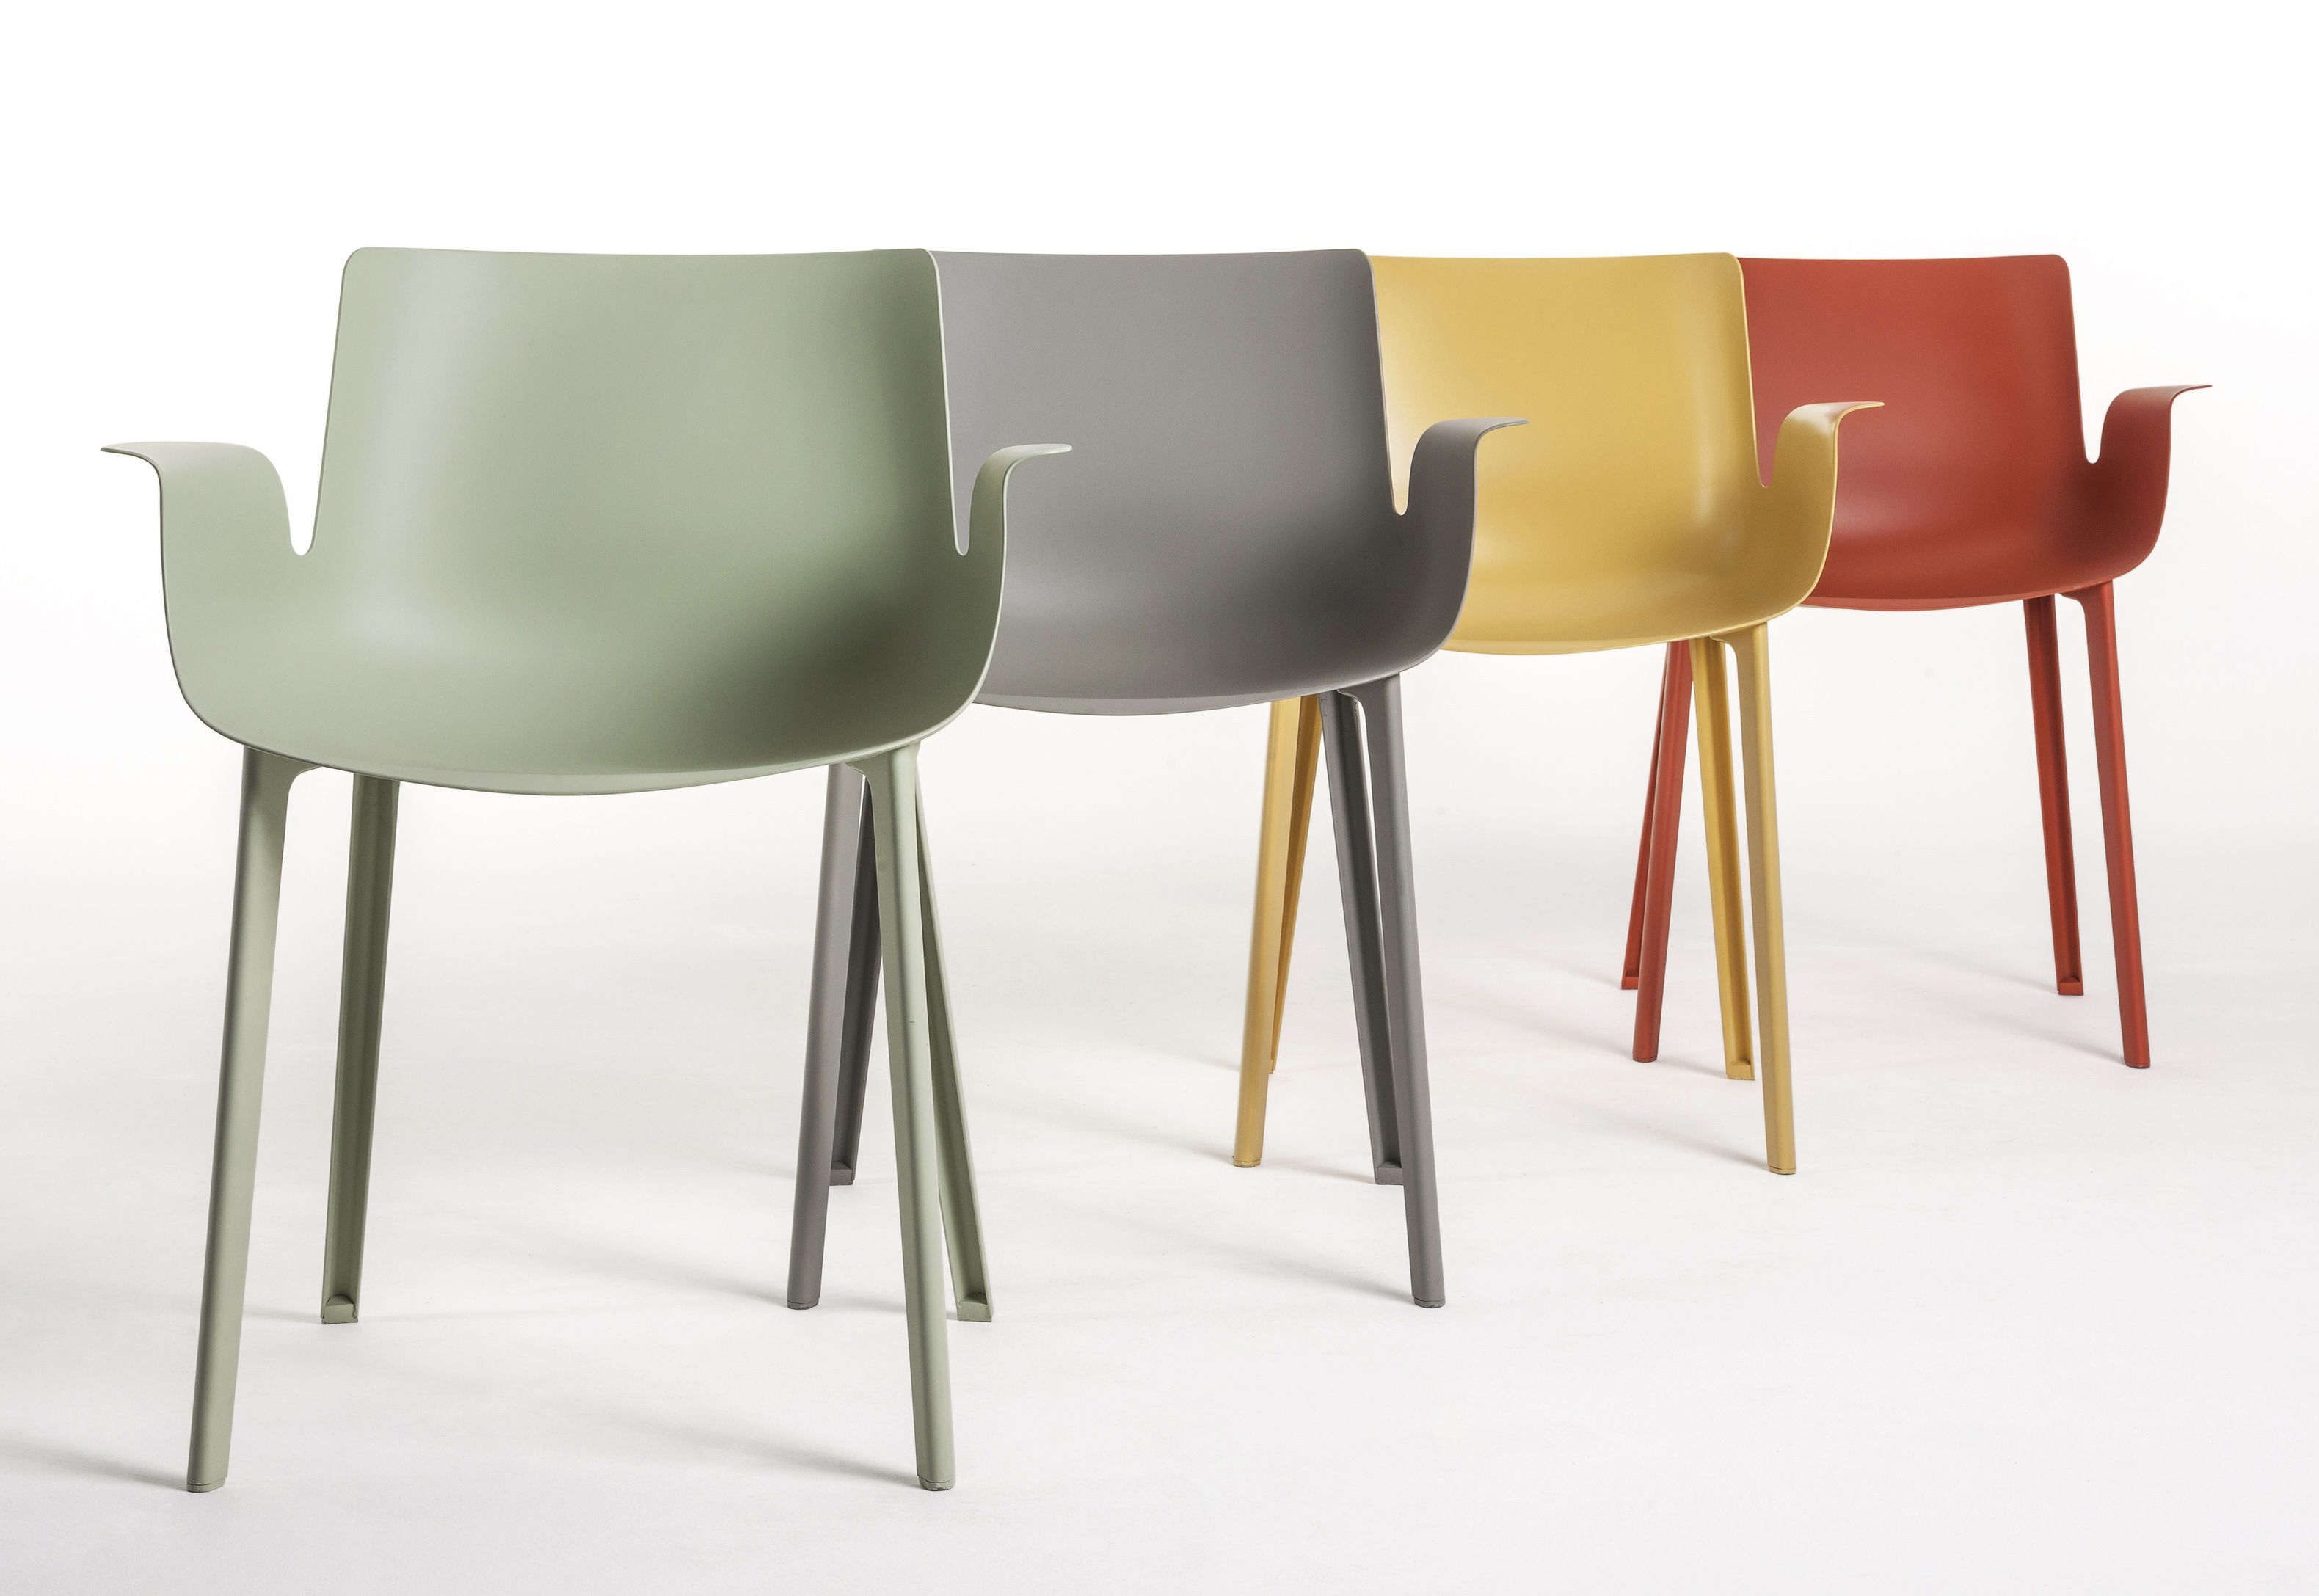 Piuma kunststoff kartell sessel for Sessel kunststoff design